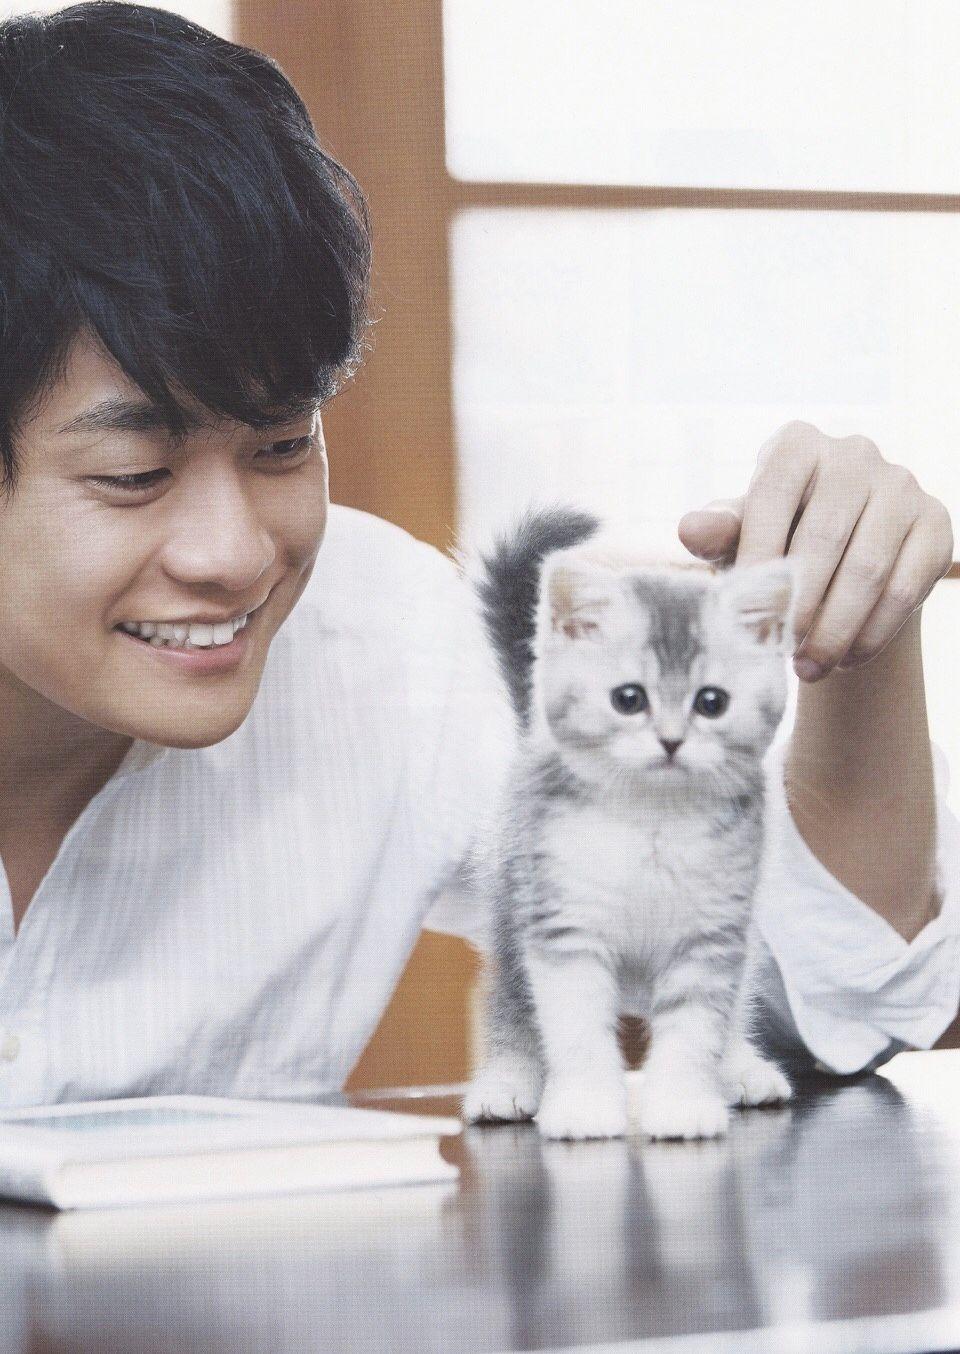 Jun Jun おしゃれまとめの人気アイデア Pinterest Q A 2021 男性声優 福山潤 声優